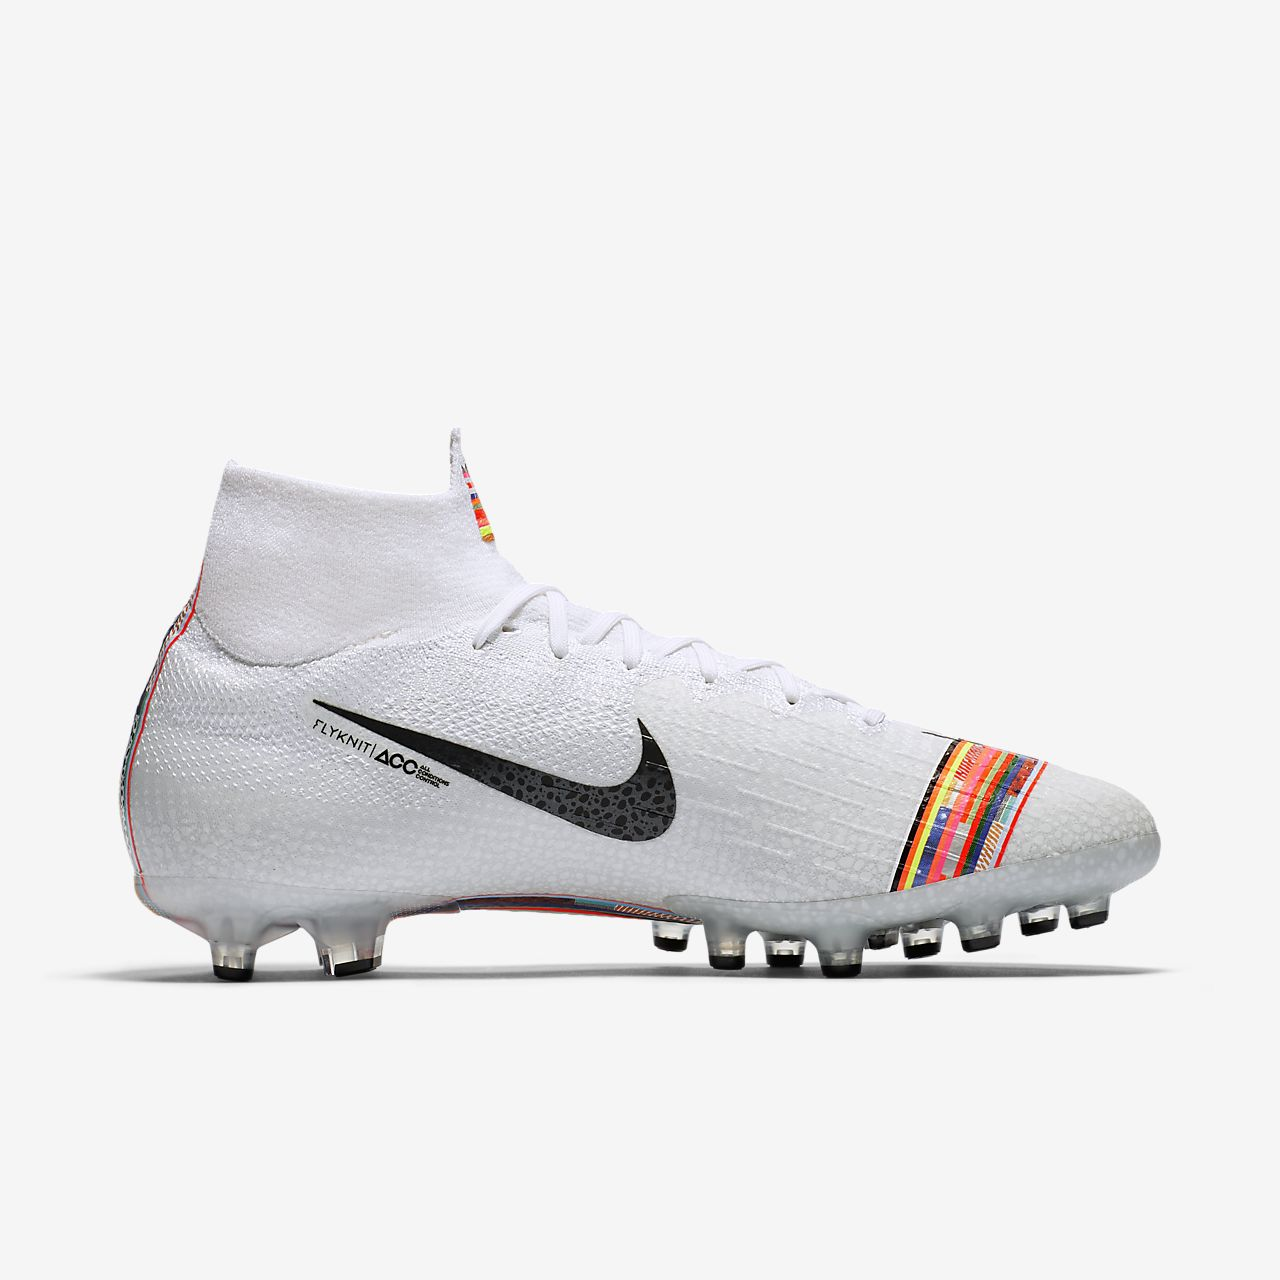 scarpe calcio nike elite